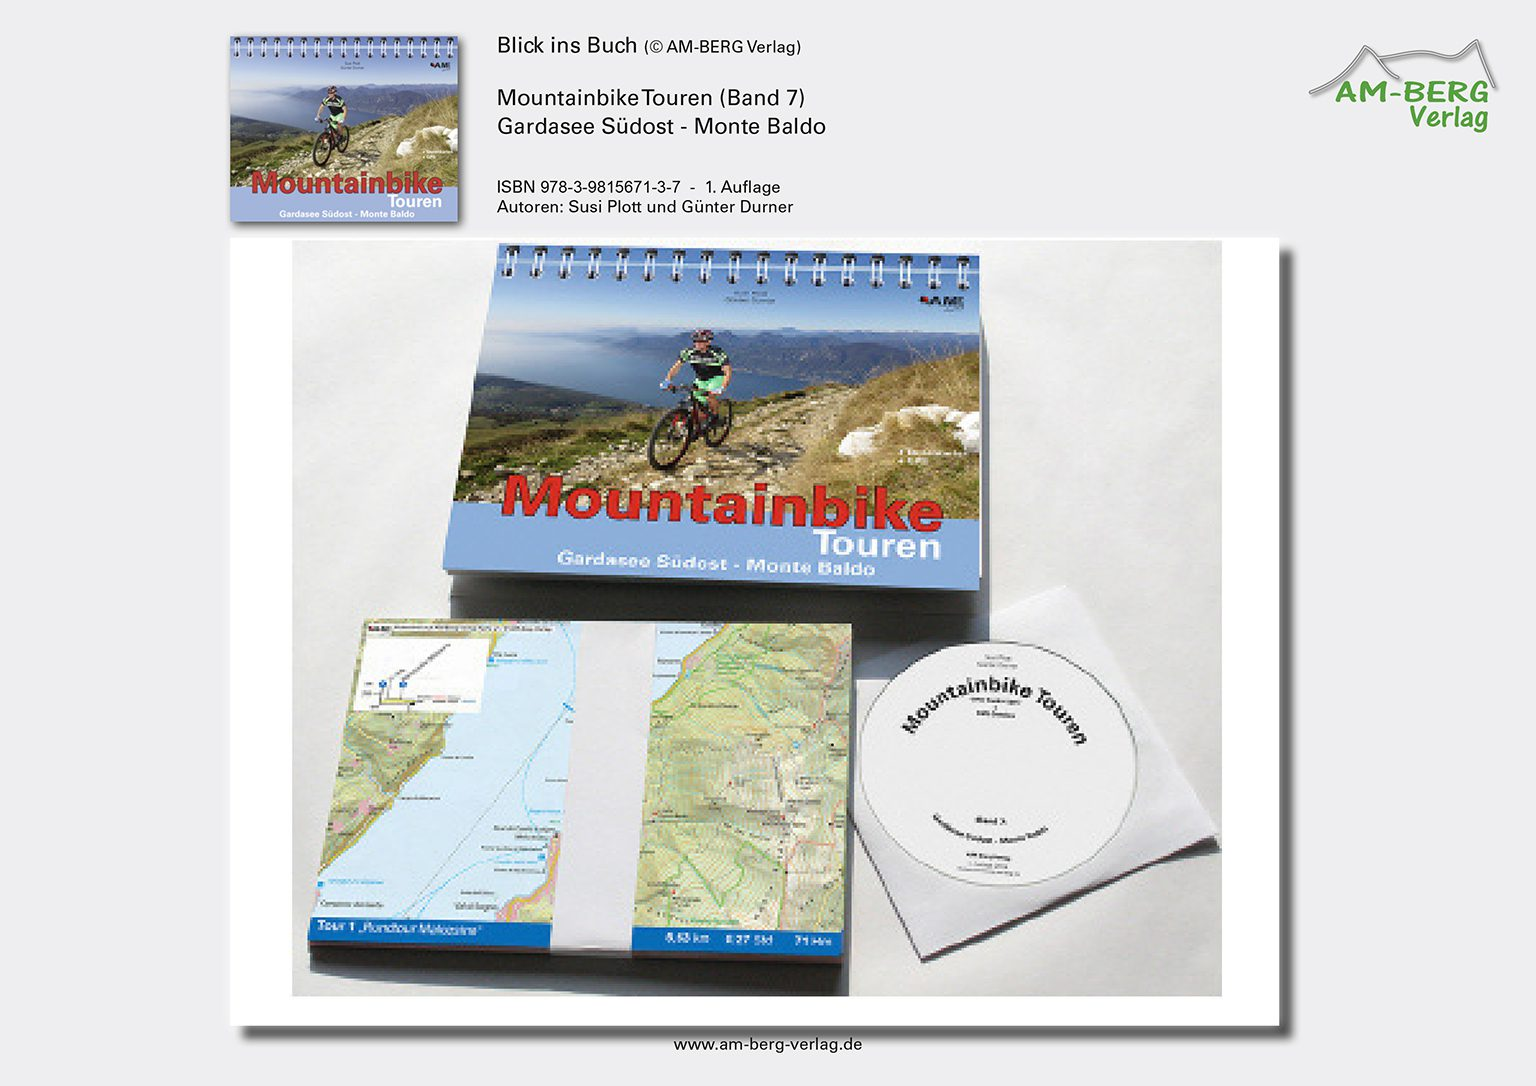 Mountainbike Touren Gardasee Südost - Monte Baldo_Ringbuch, Tourenkarten, CD